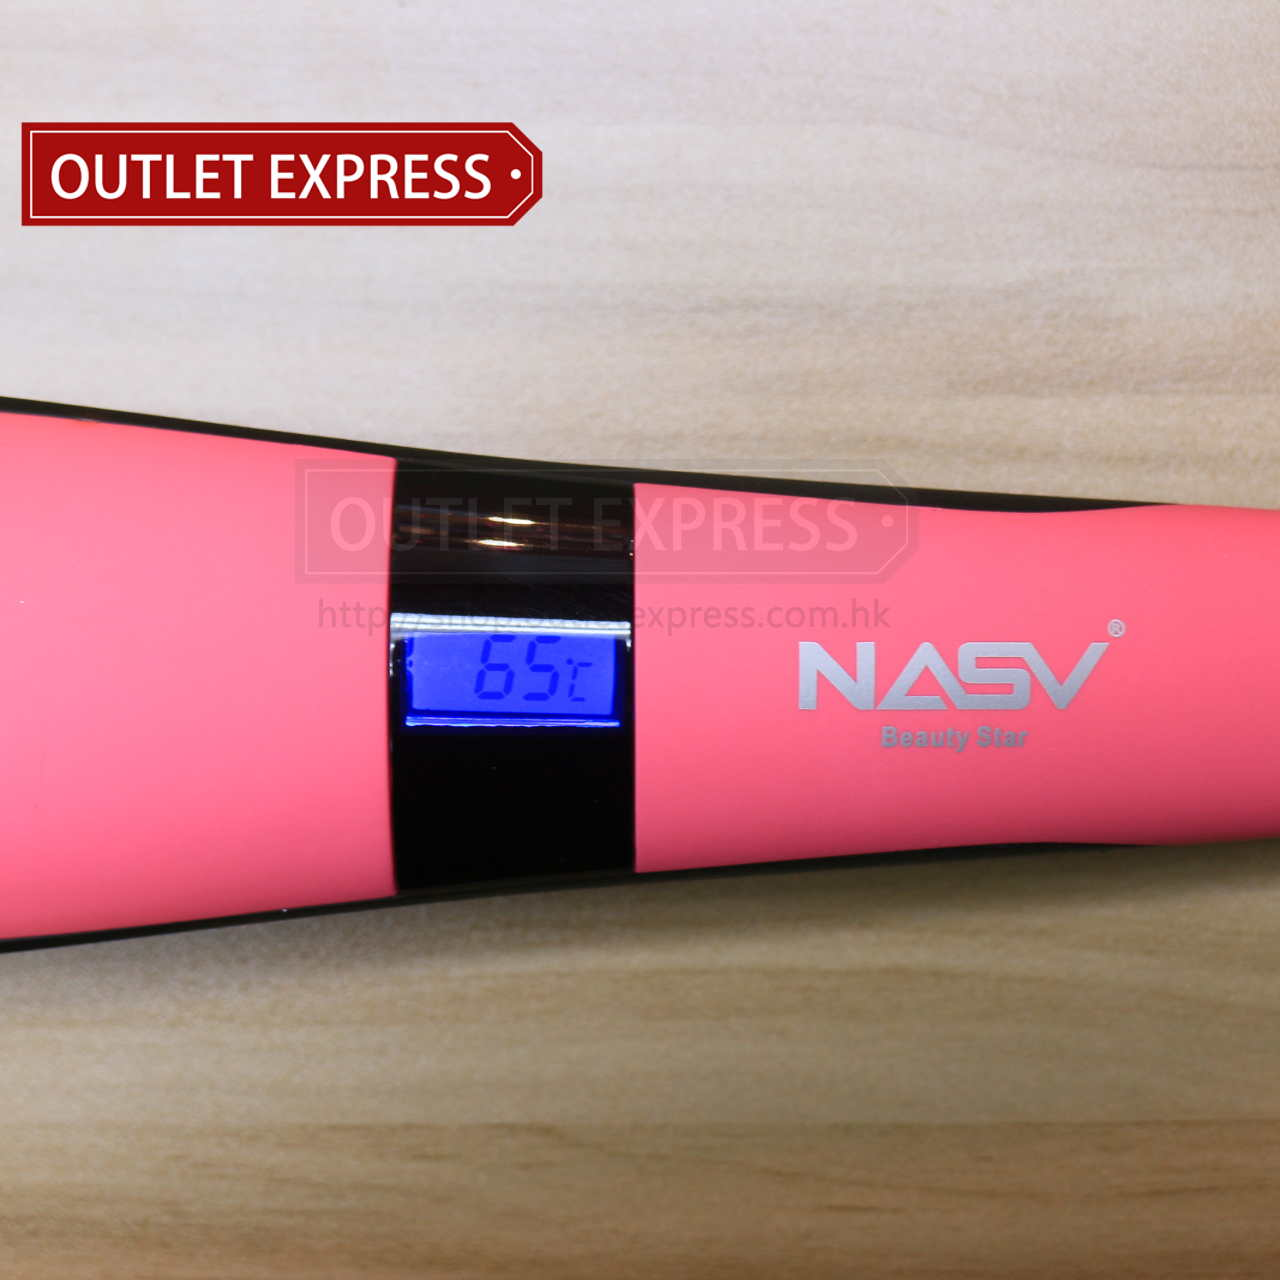 NASV-300 負離子直髮梳 溫度顯示- Outlet Express HK 生活百貨城實拍相片